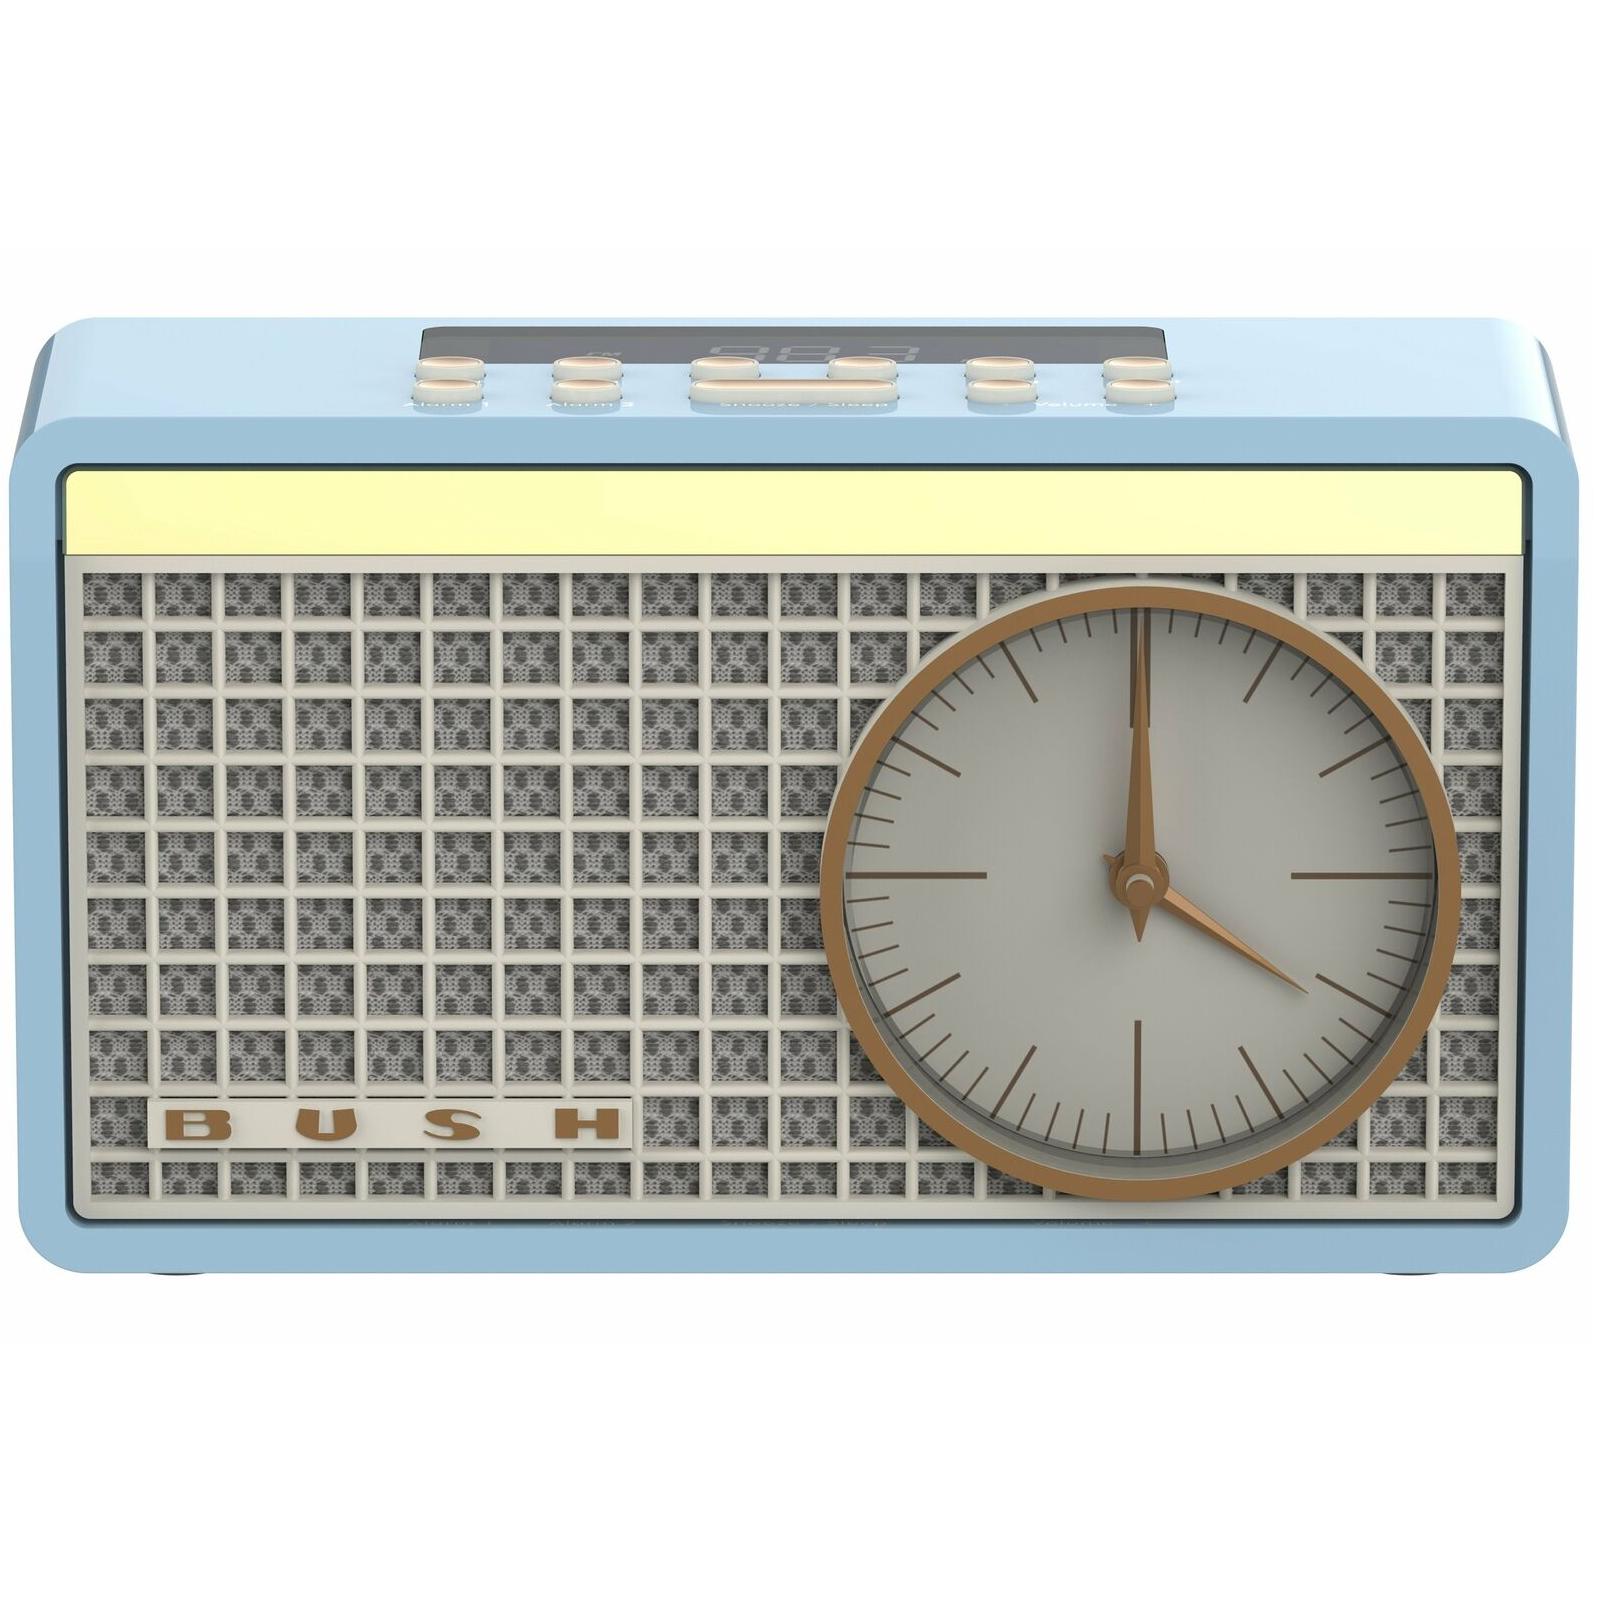 Bush Classic Retro Analogue Clock Radio - Blue/New £4.99 @ Argos / eBay (Free C&C)